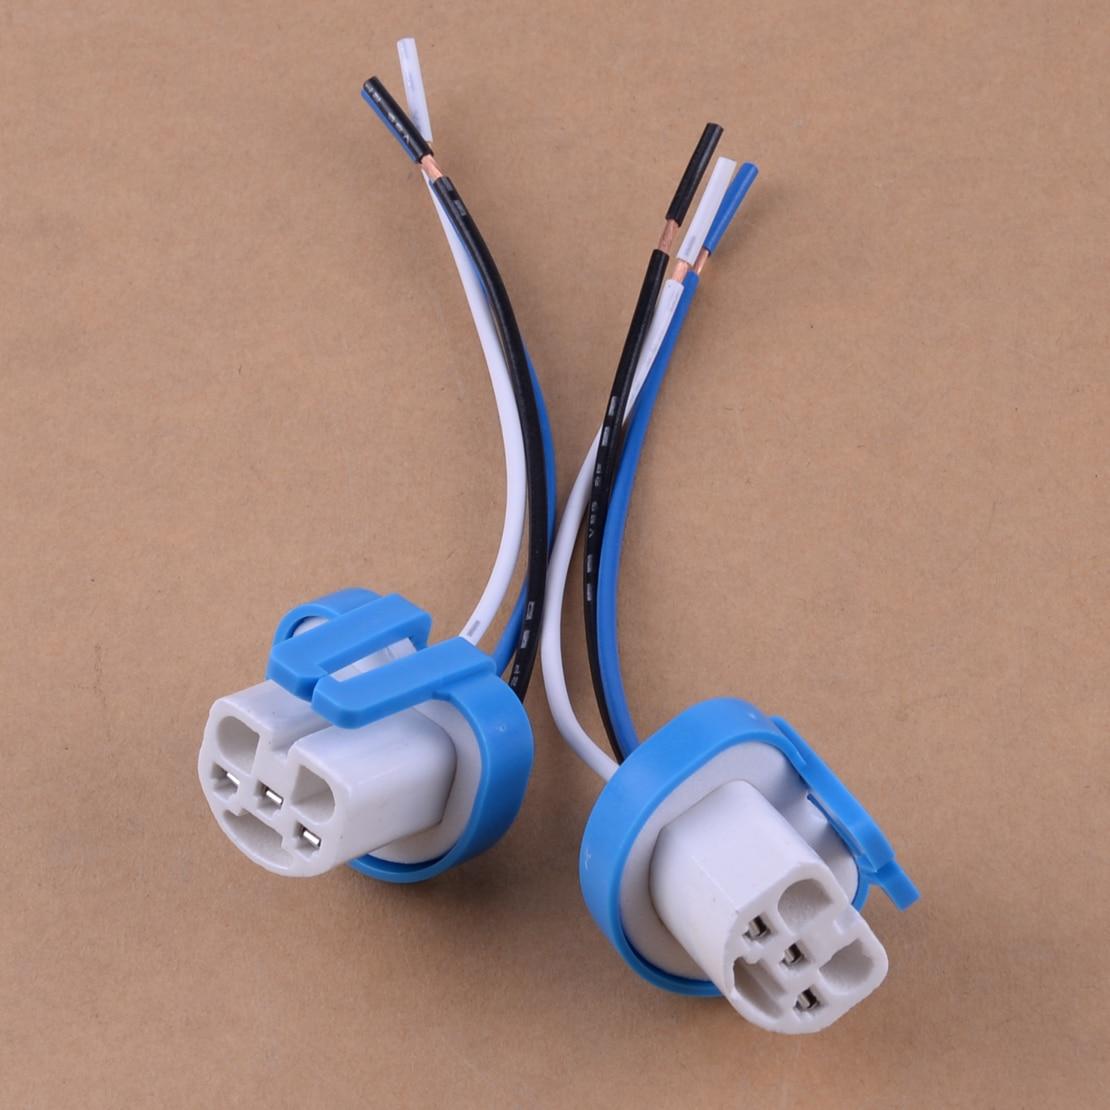 dwcx car auto 2pcs 9007 9004 headlight wiring adapter. Black Bedroom Furniture Sets. Home Design Ideas